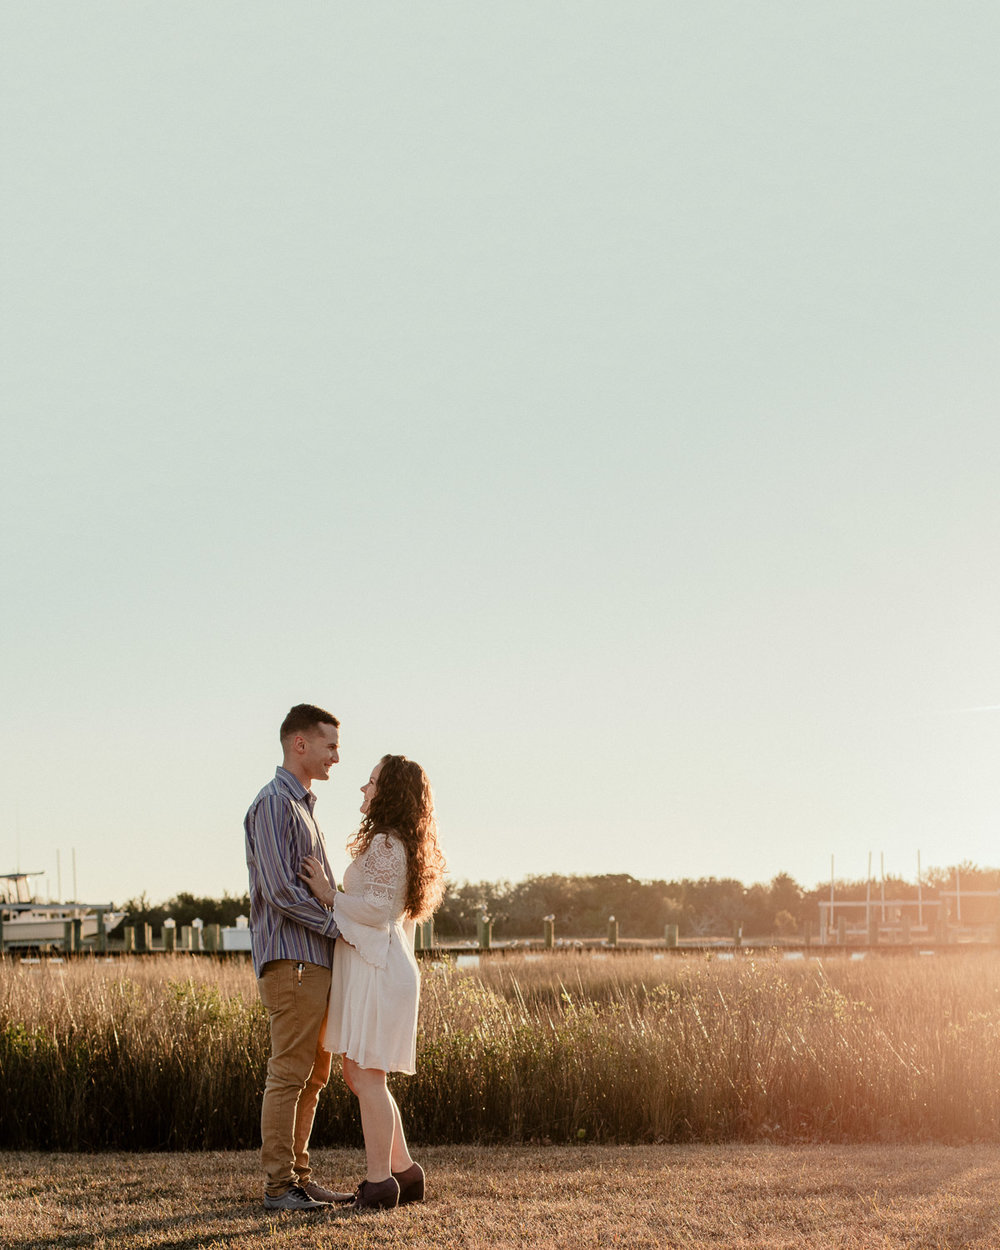 Engagement-Photographer-Beaufort-North-Carolina-4.jpg